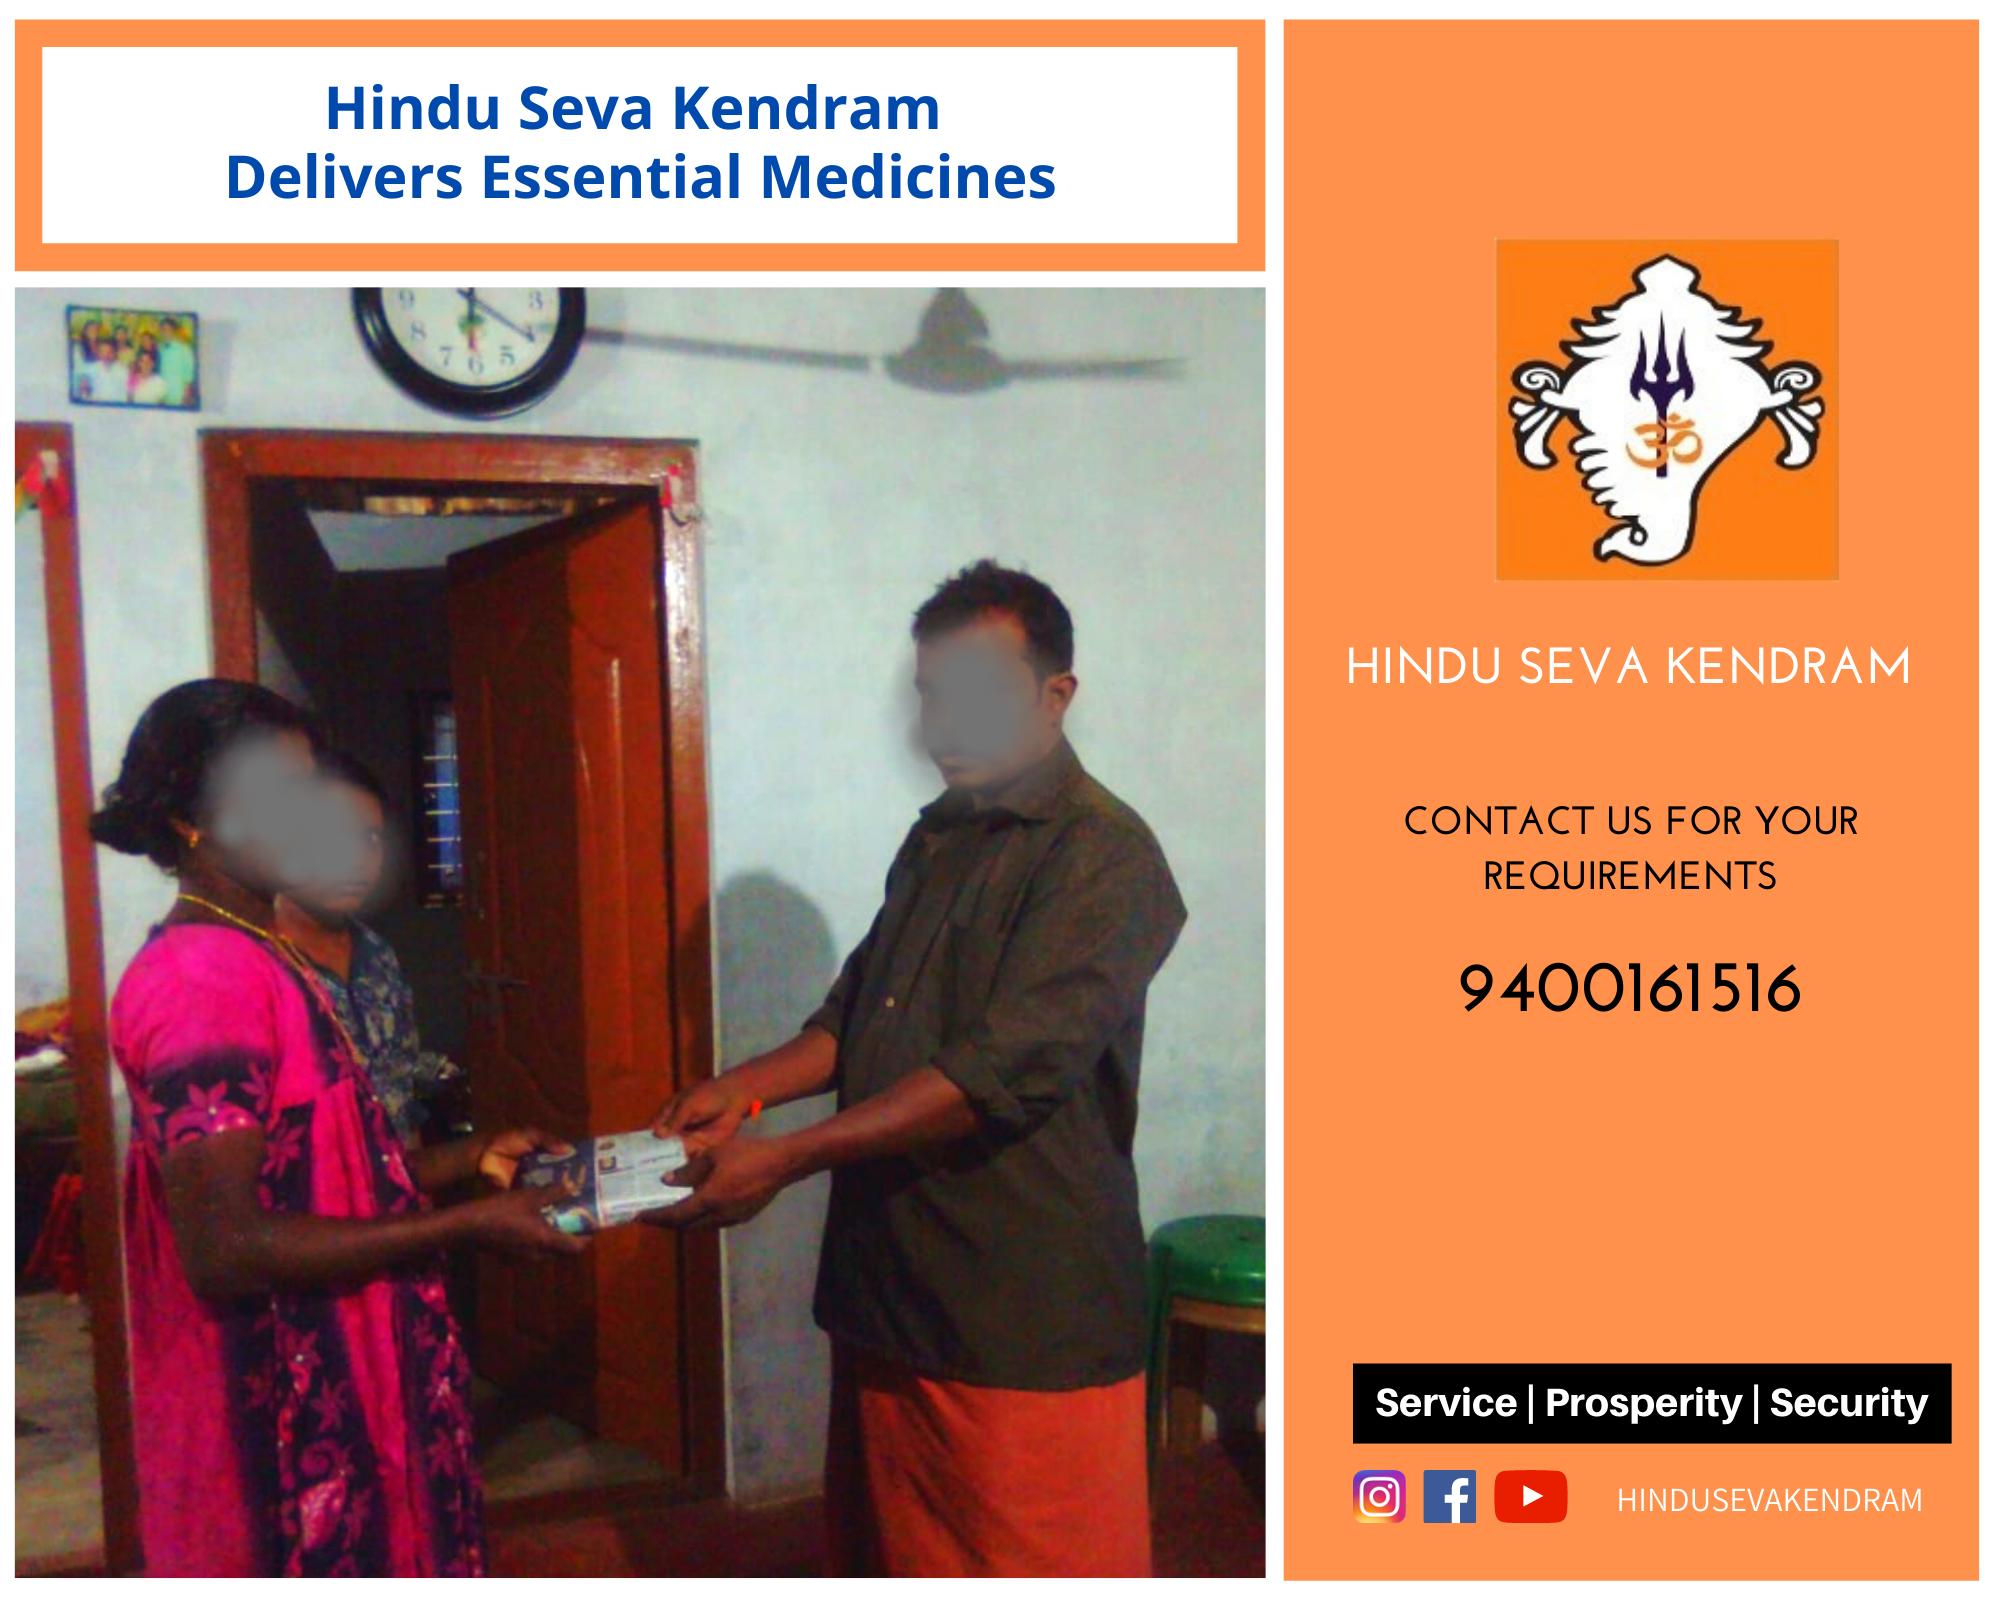 Hindu Seva Kendram Delivers Essential Medicine